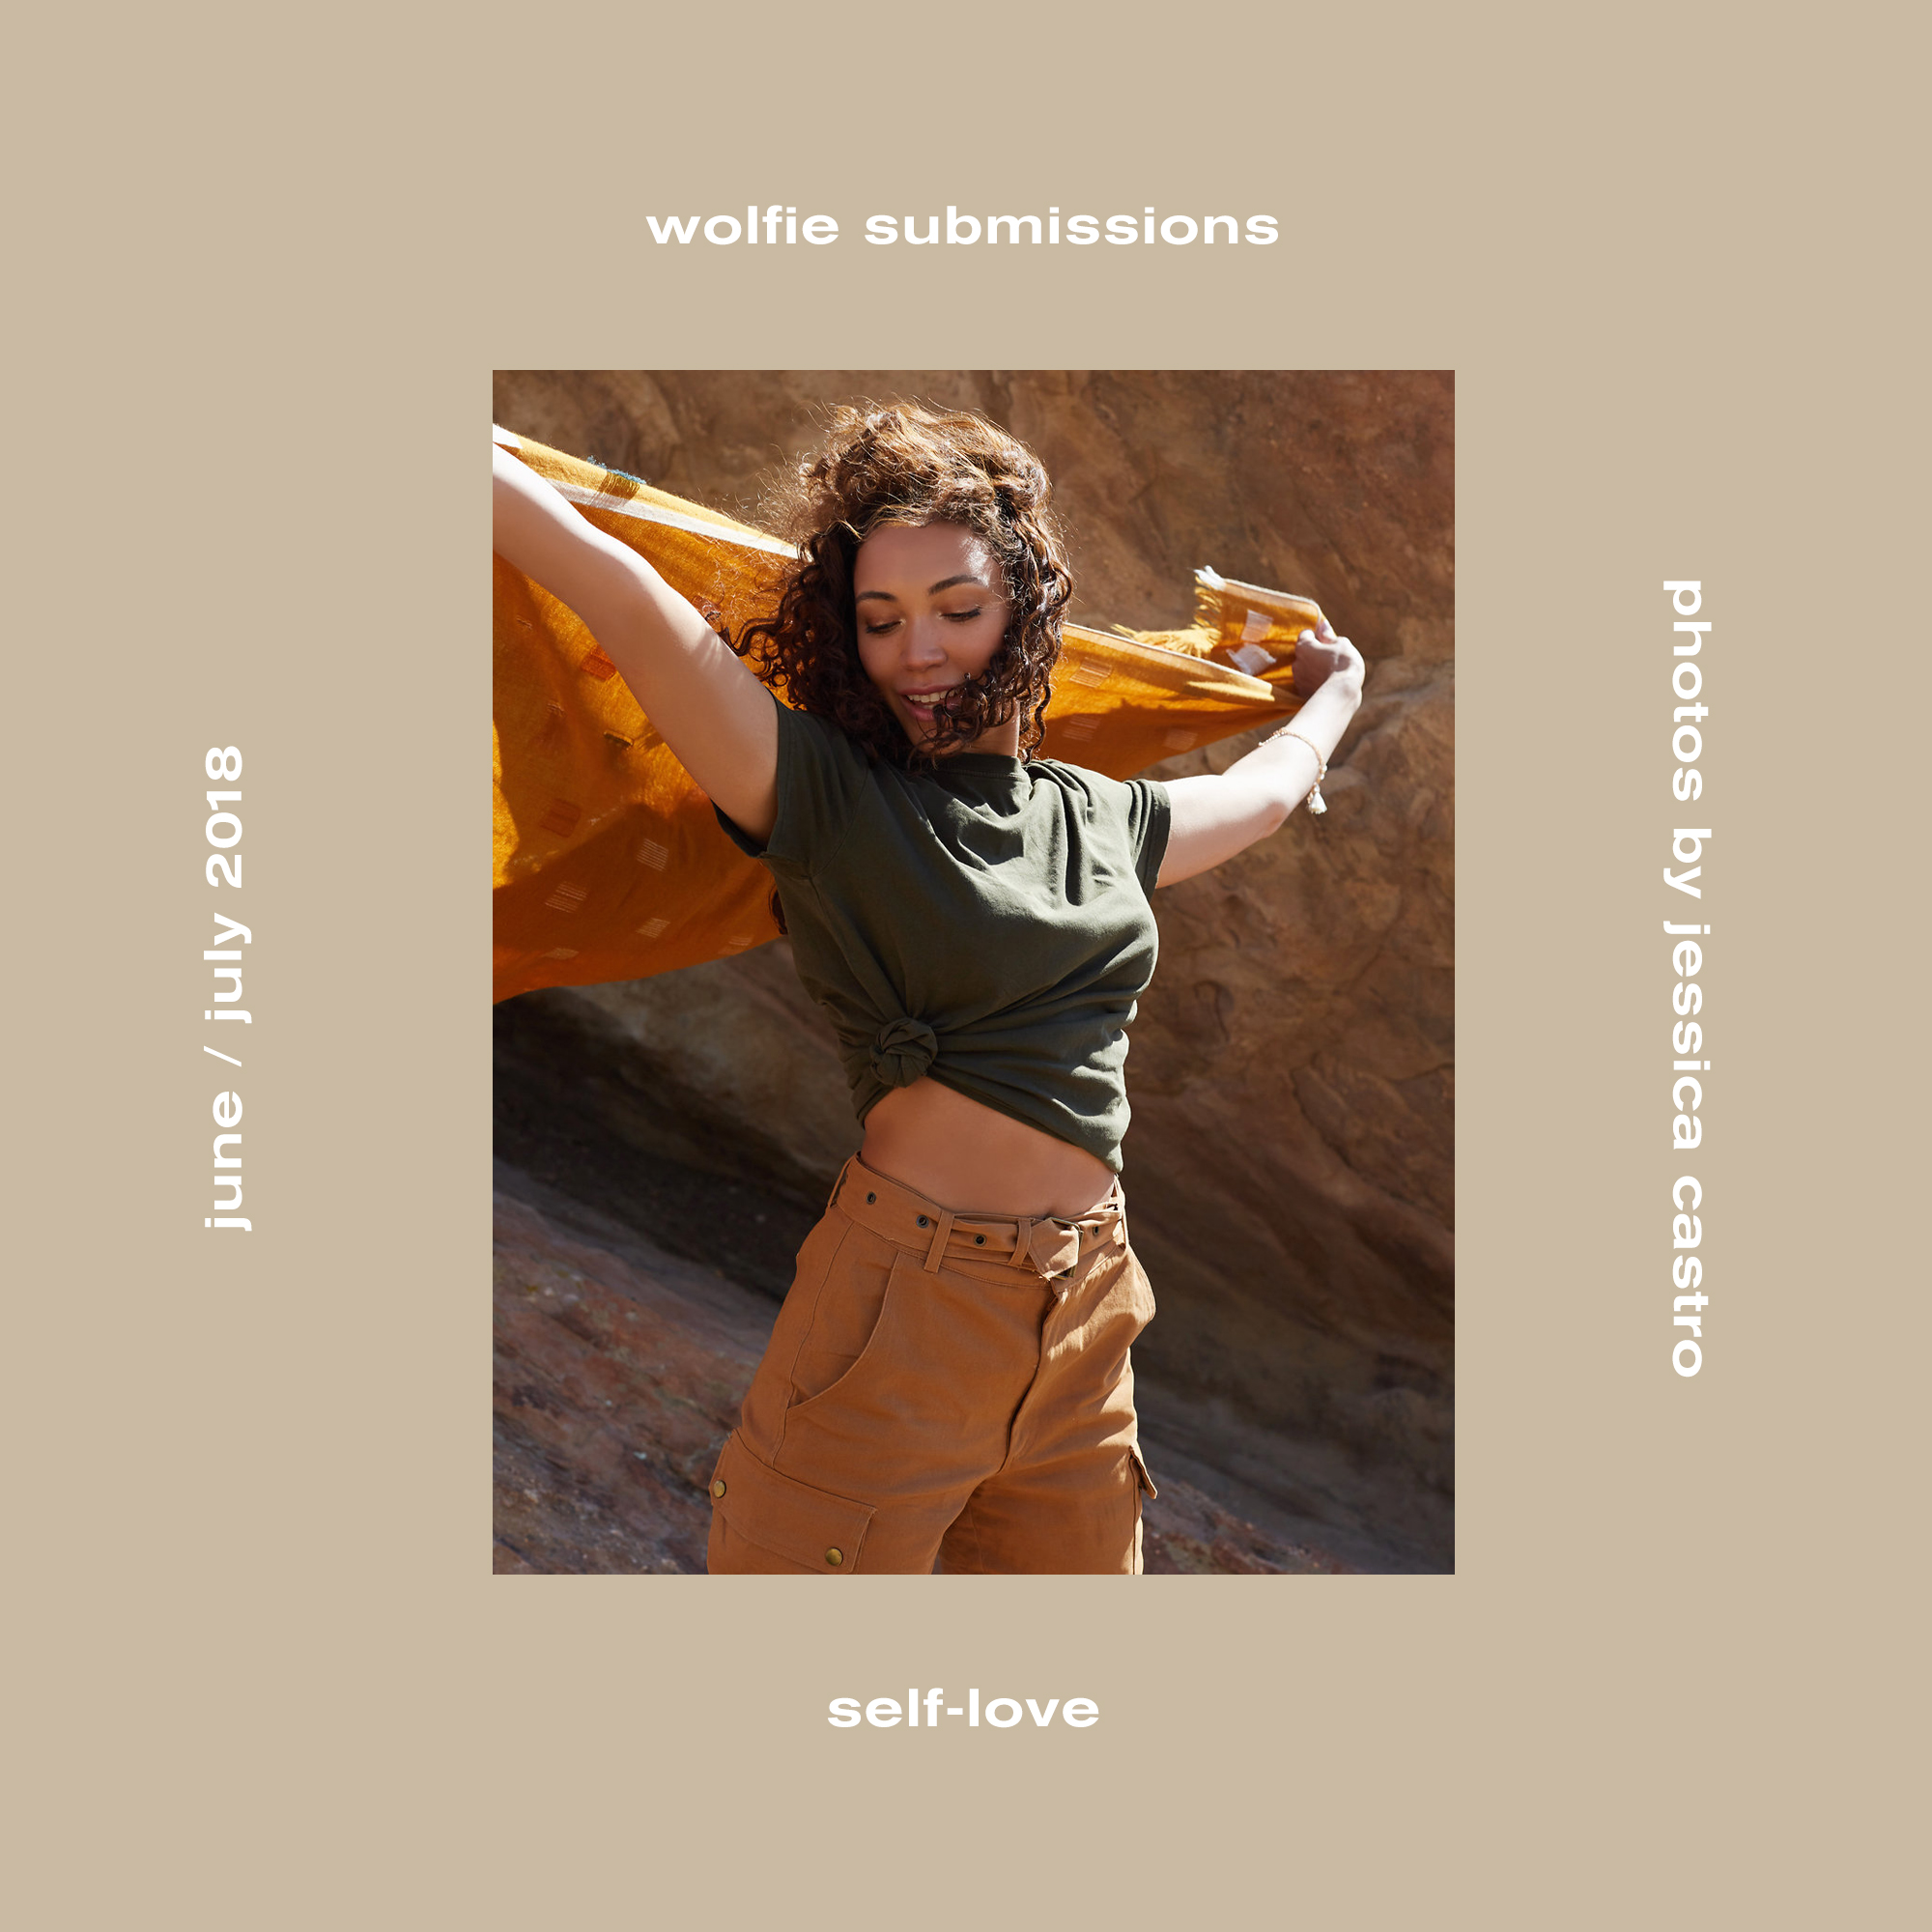 Self-Love WS 2018